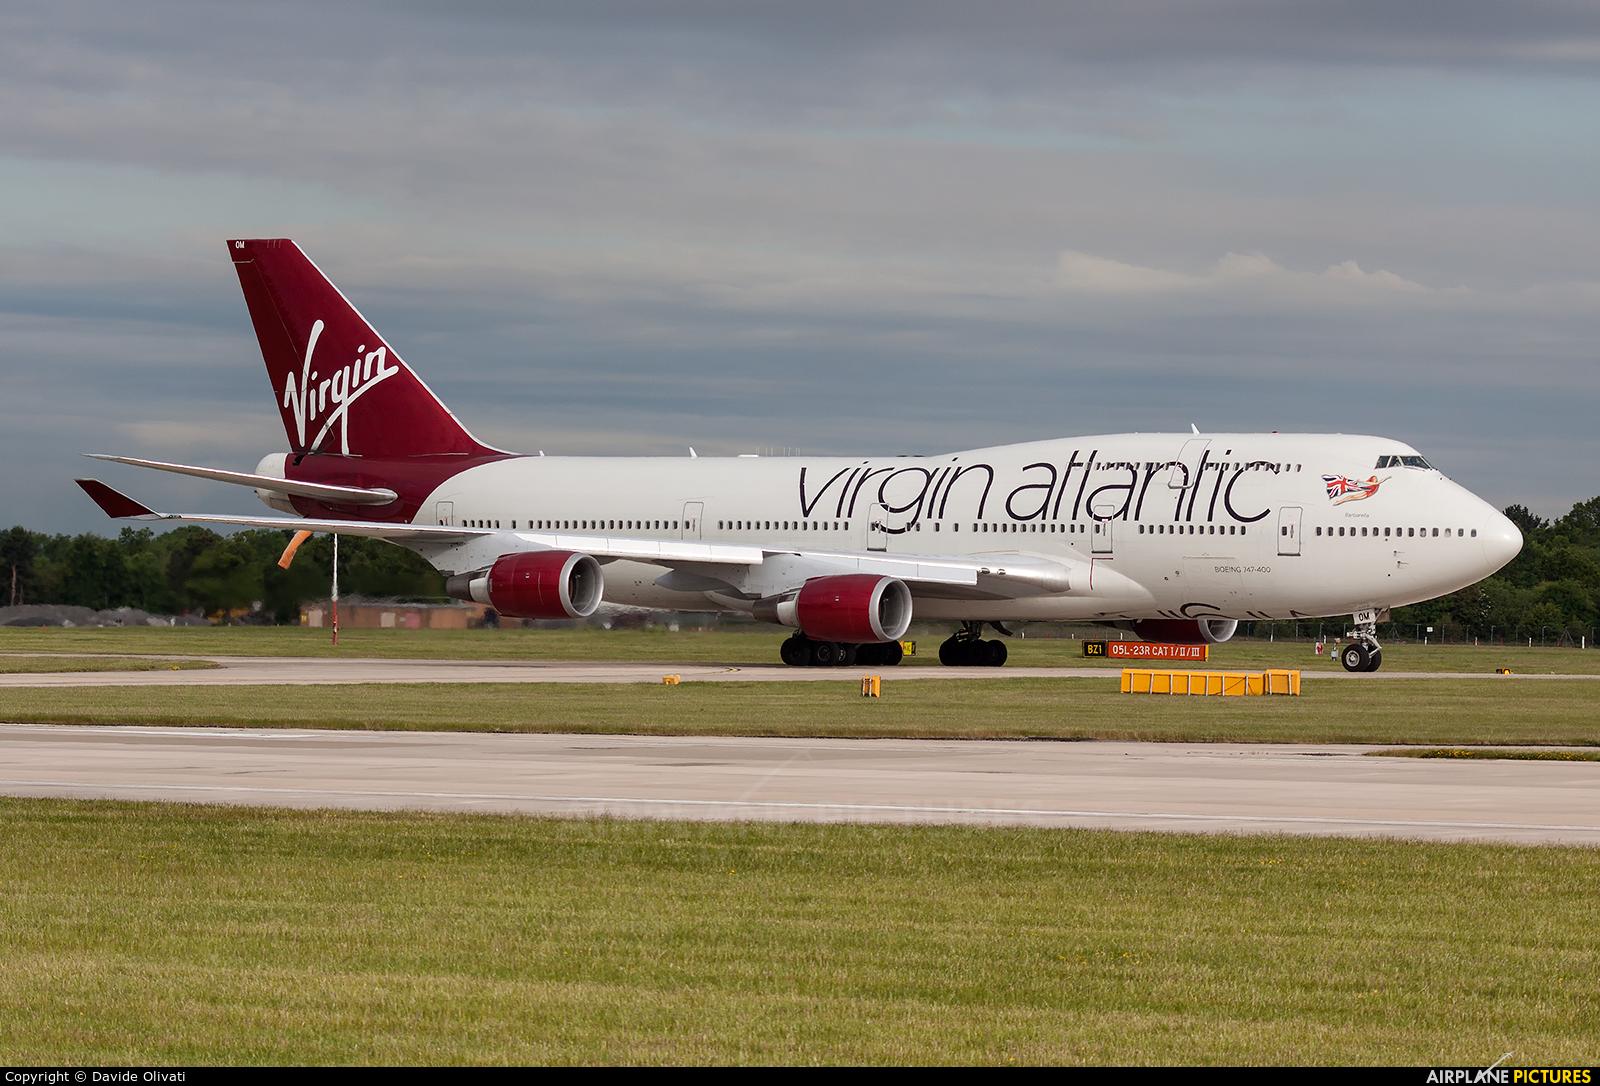 Virgin Atlantic G-VROM aircraft at Manchester